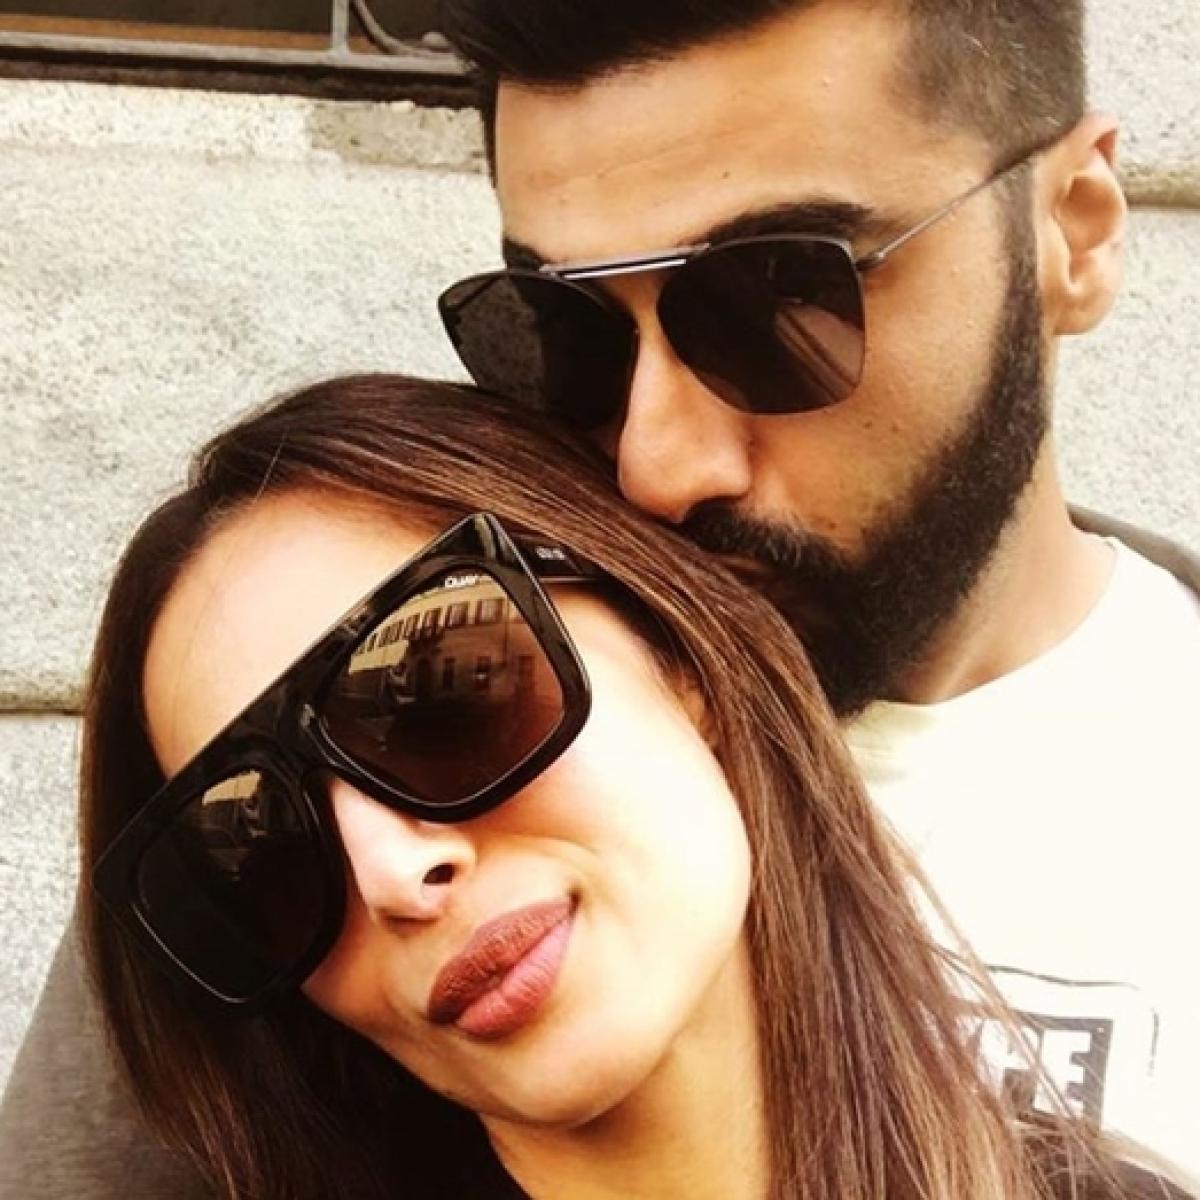 Arjun Kapoor's wedding plans with Malaika Arora ruined due to coronavirus?